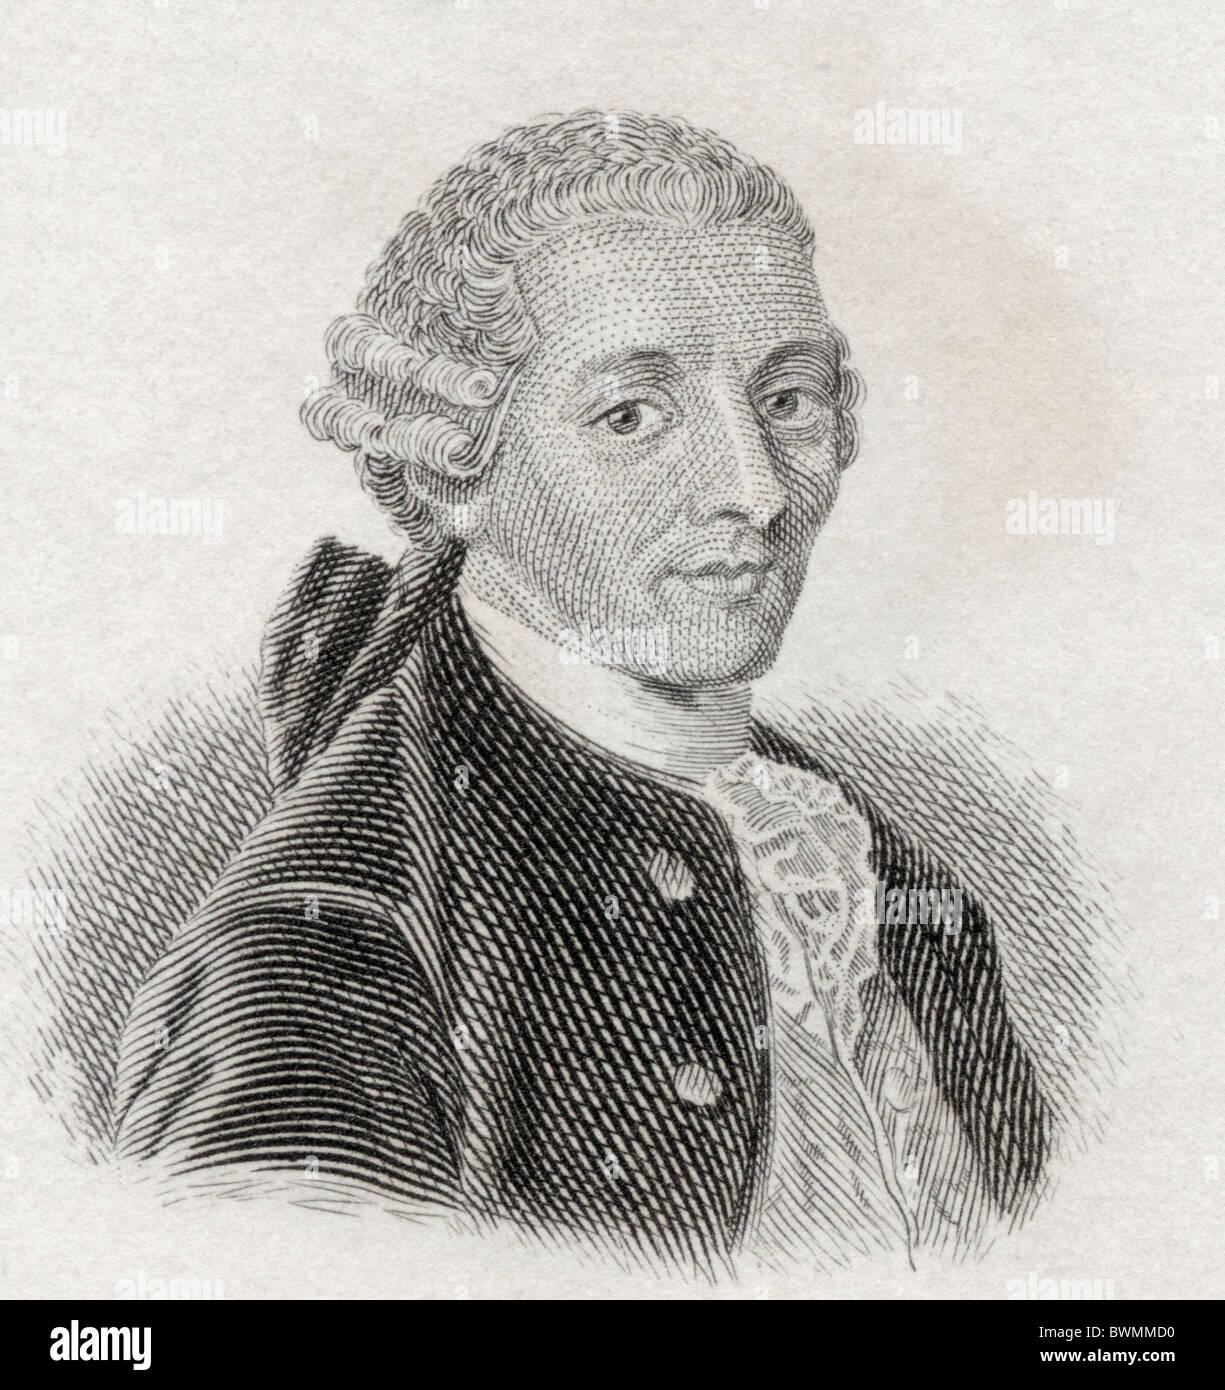 Franz Joseph Haydn, 1732 to 1809. Austrian composer. - Stock Image